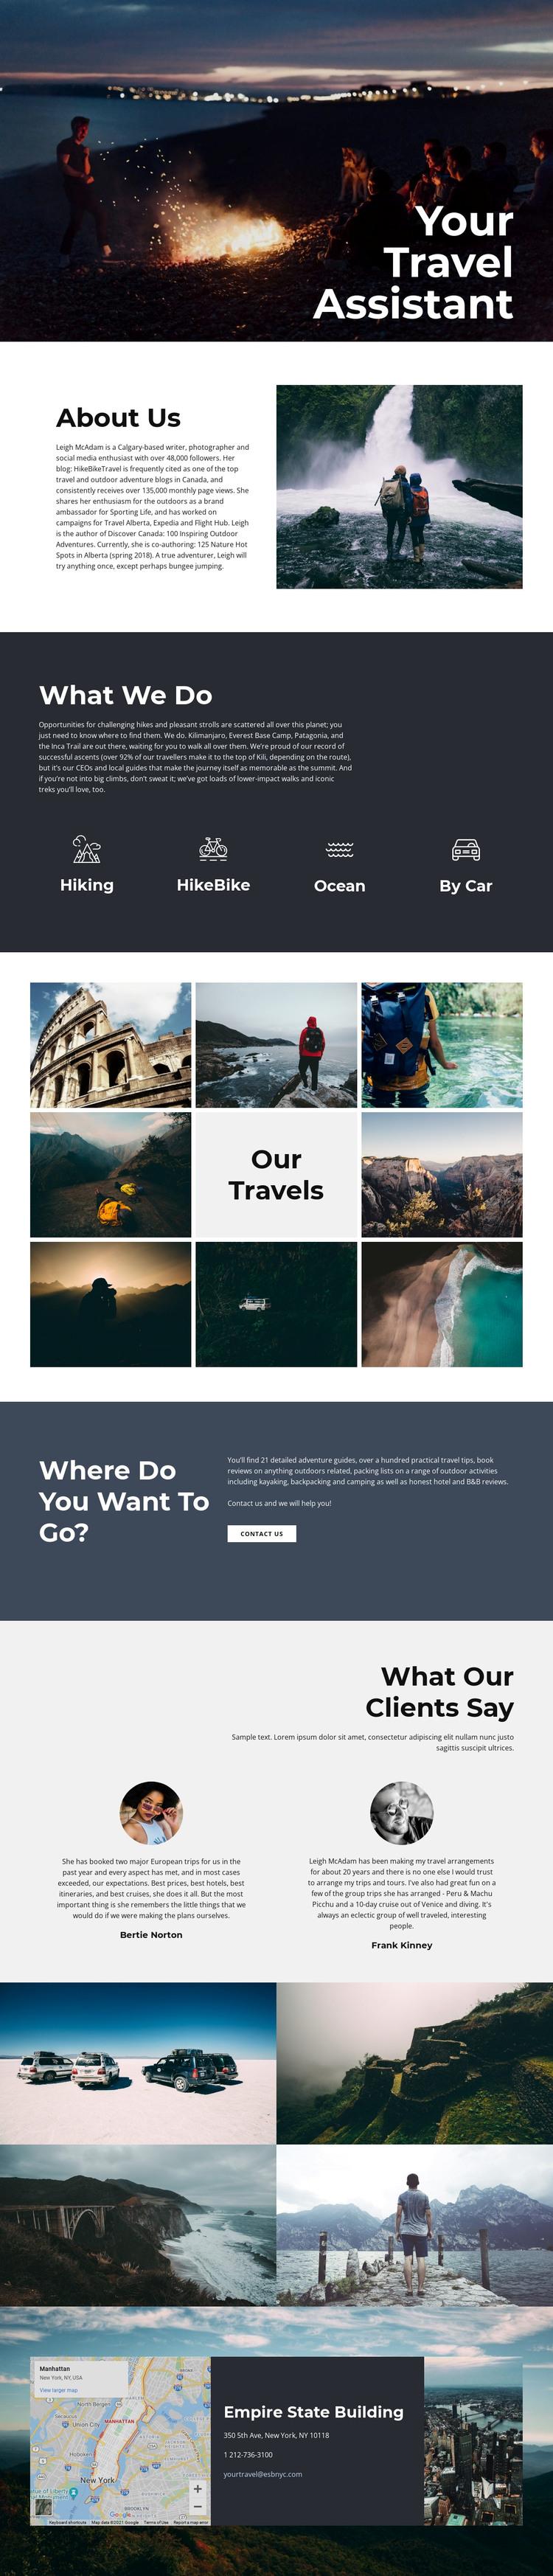 Travel Assistant WordPress Theme